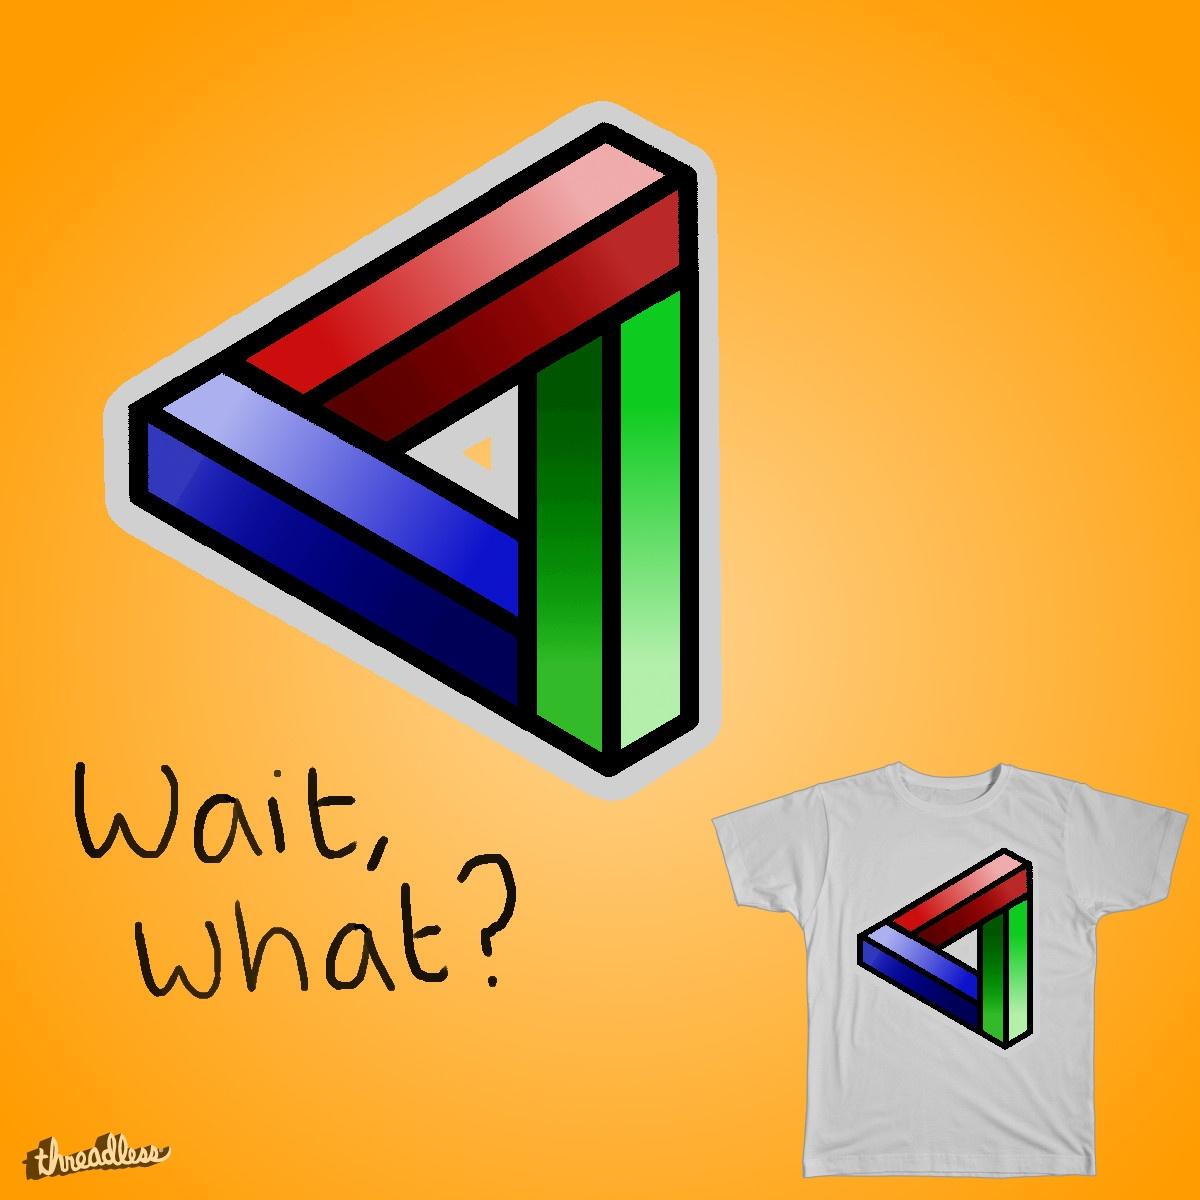 Wait, what? by Danwilz on Threadless